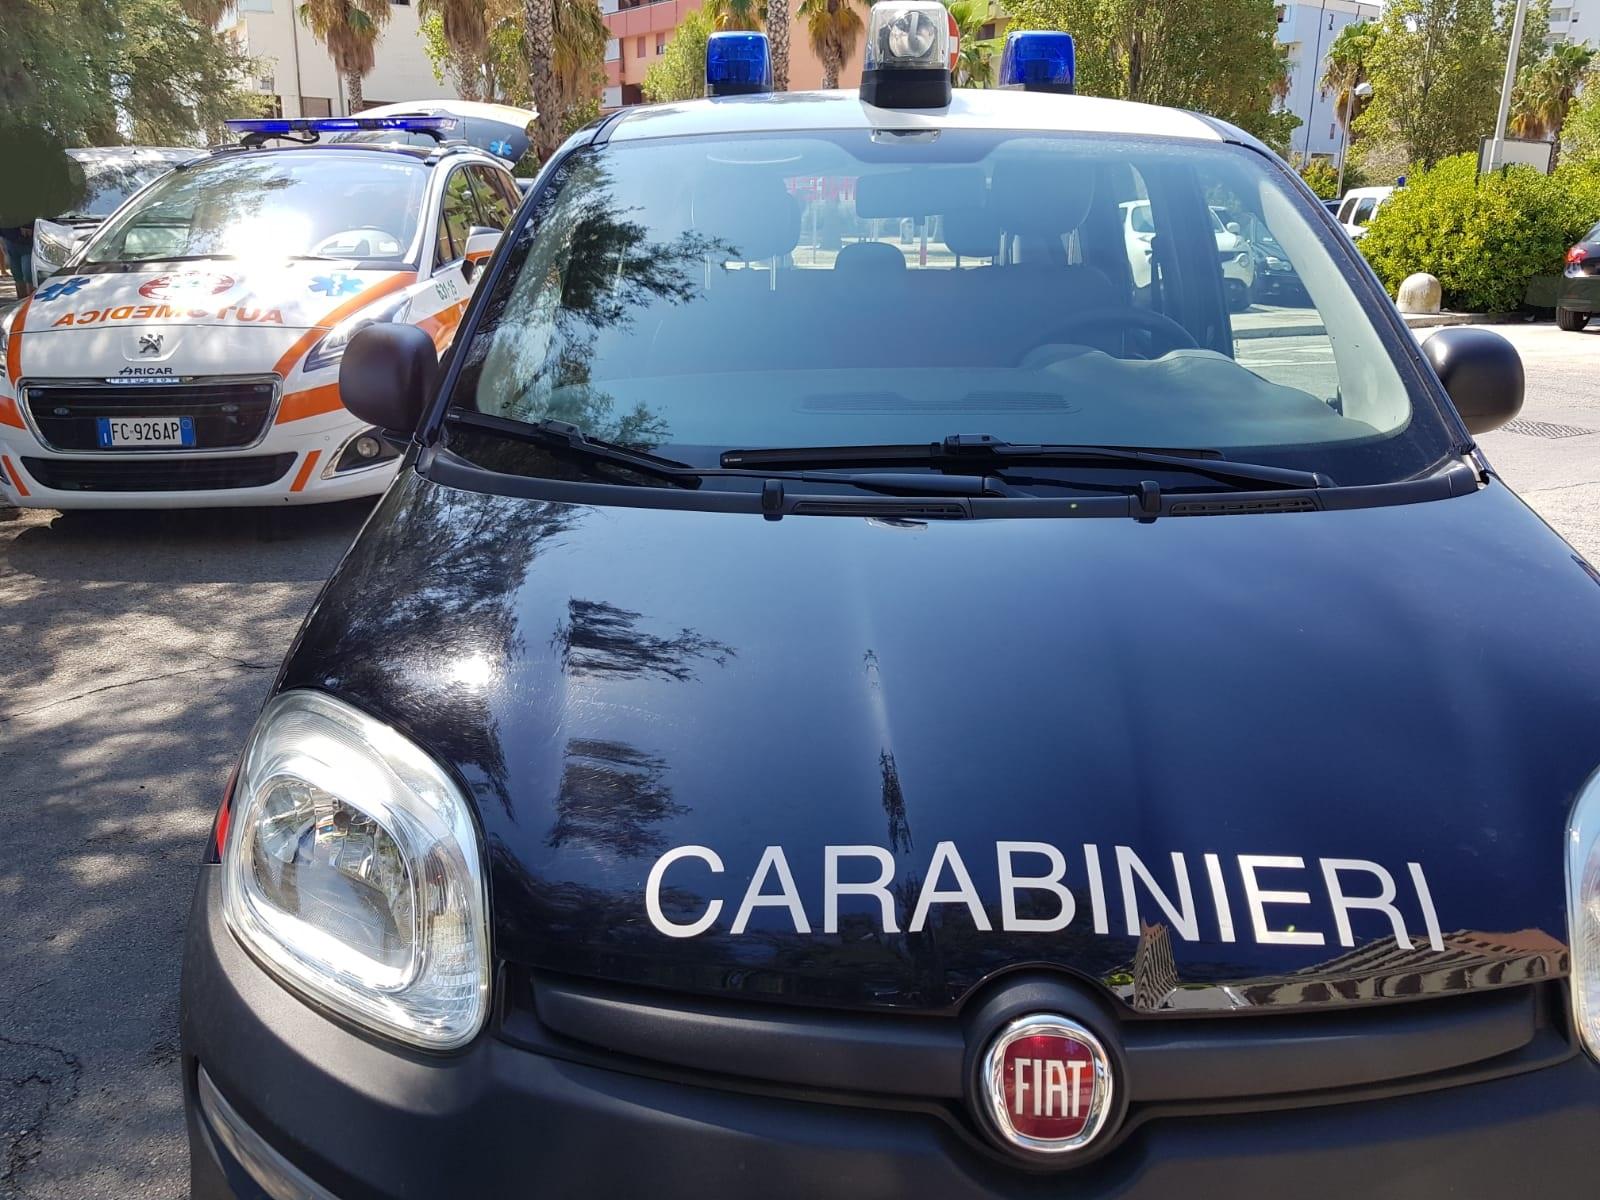 carabinieri-ambulanza-3-archi-118